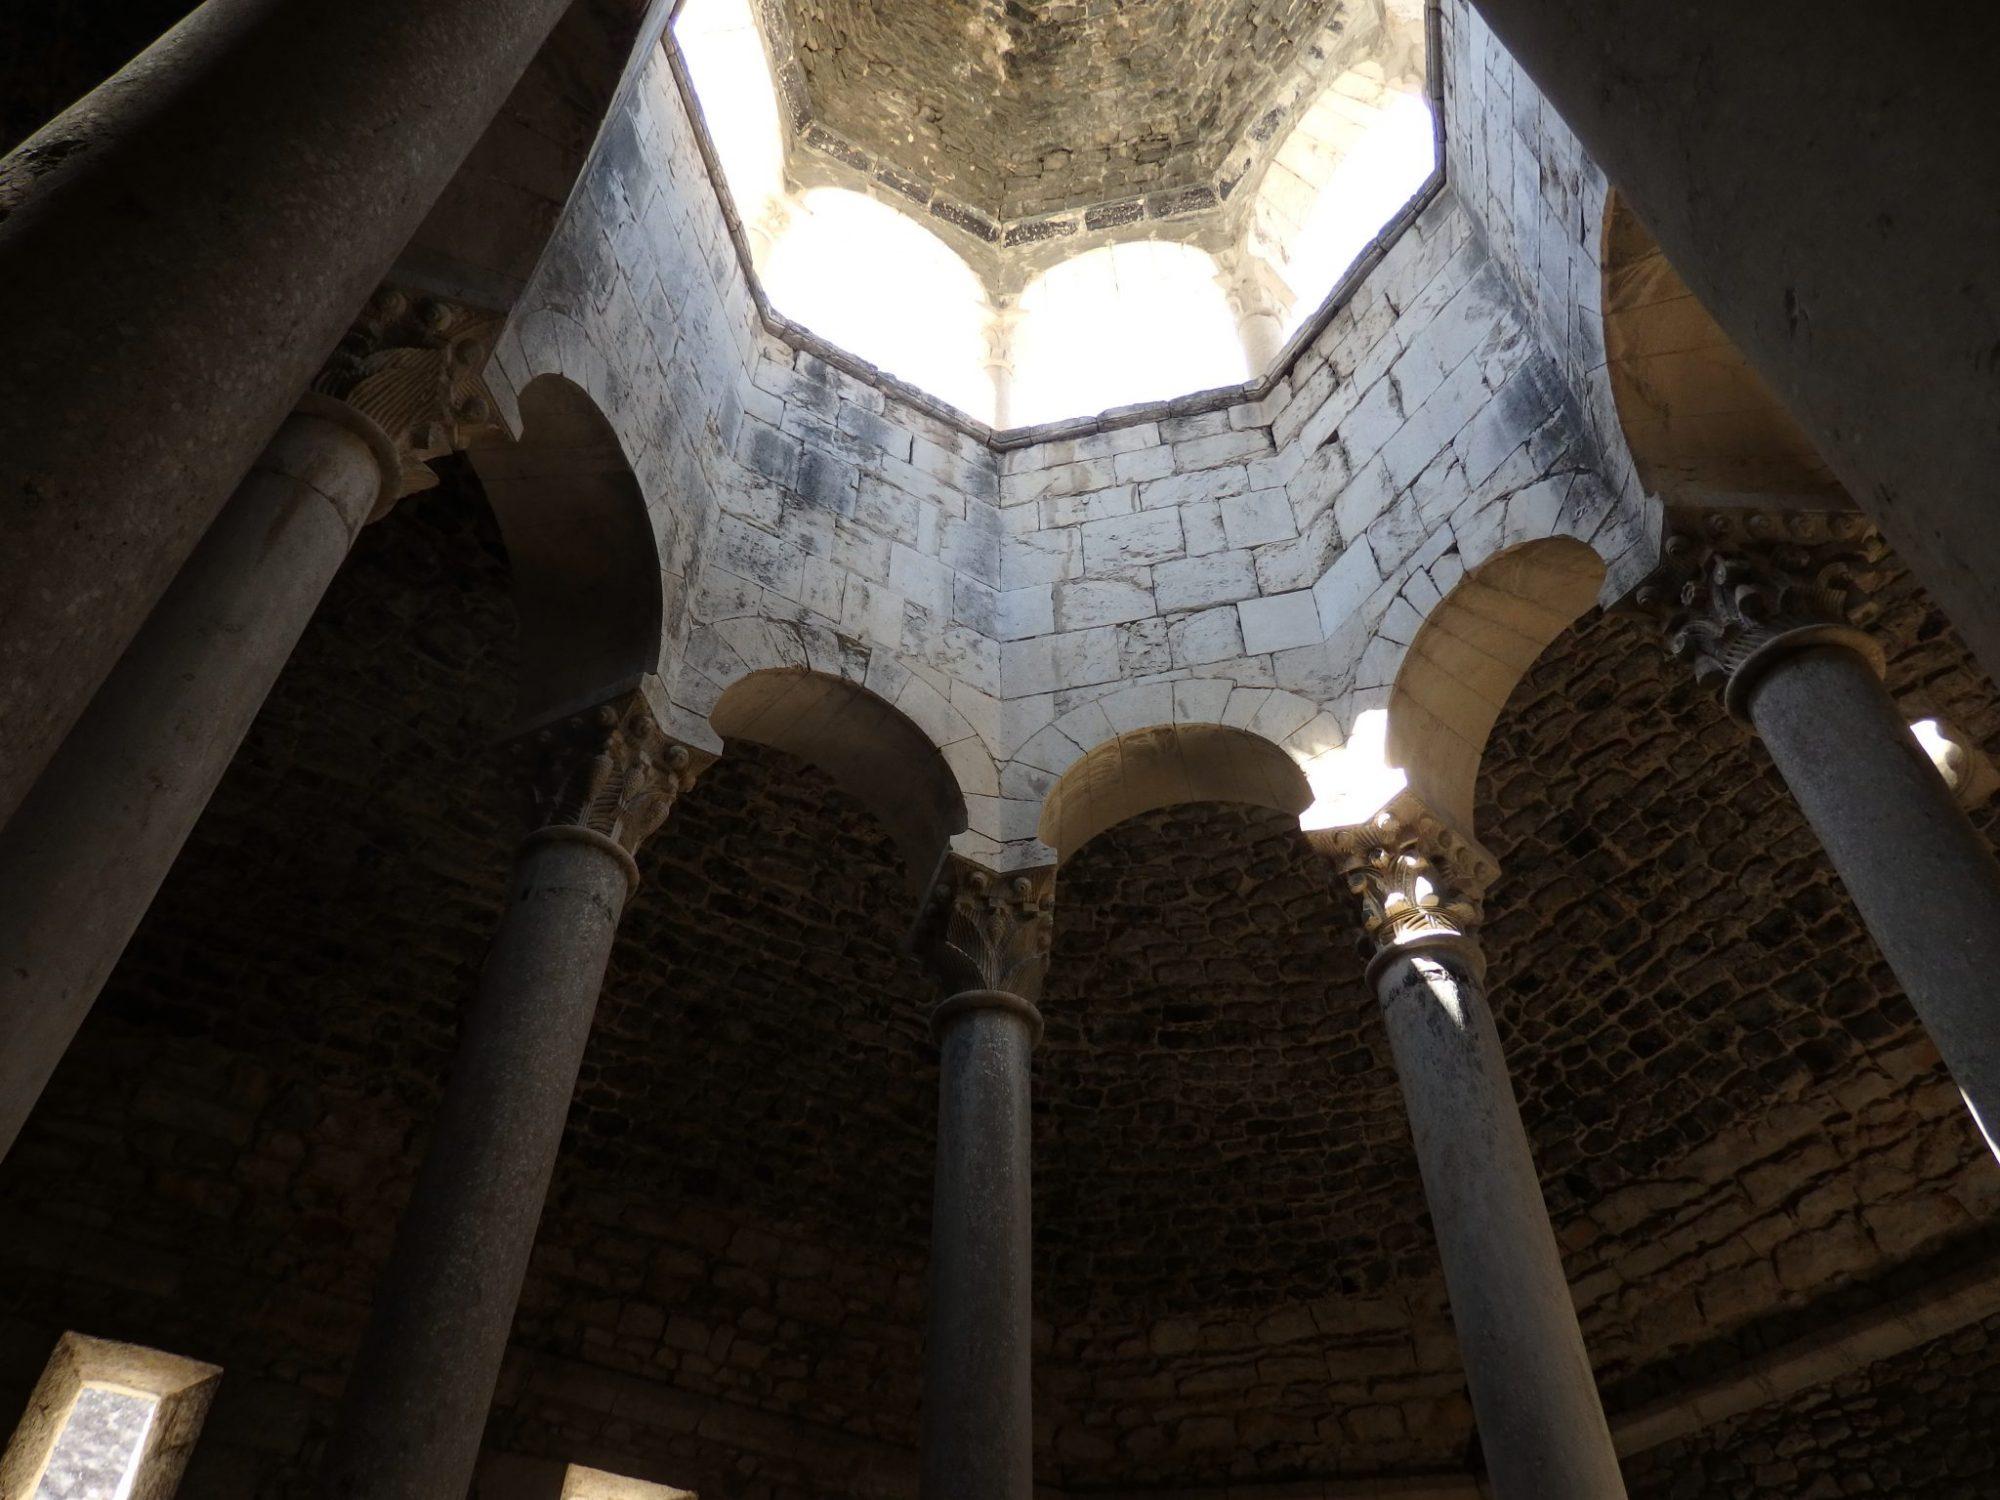 the Arab baths in Girona, Spain